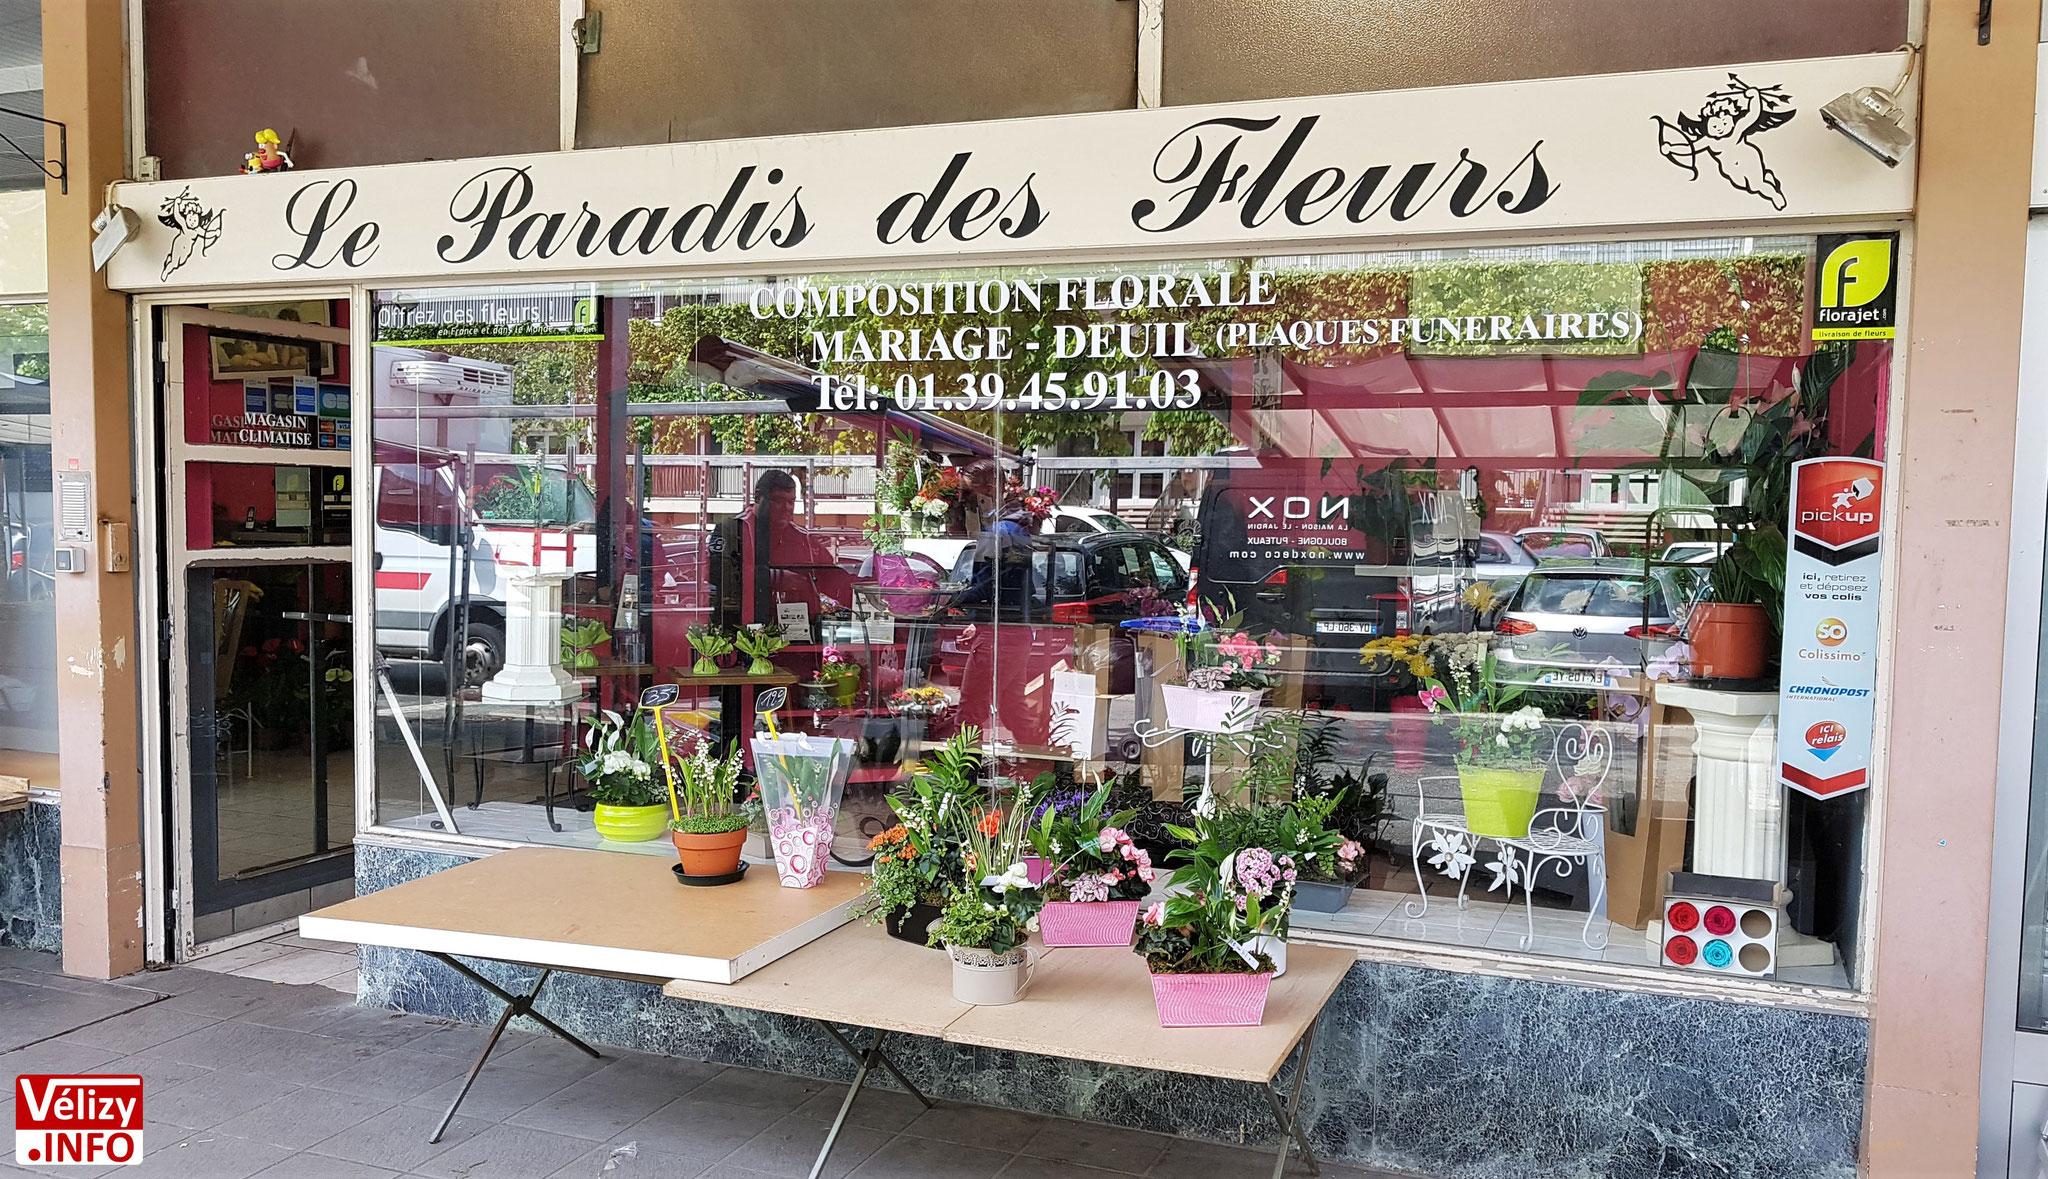 Mardi 1er mai 2018 - Vente du muguet à Vélizy-Villacoublay.